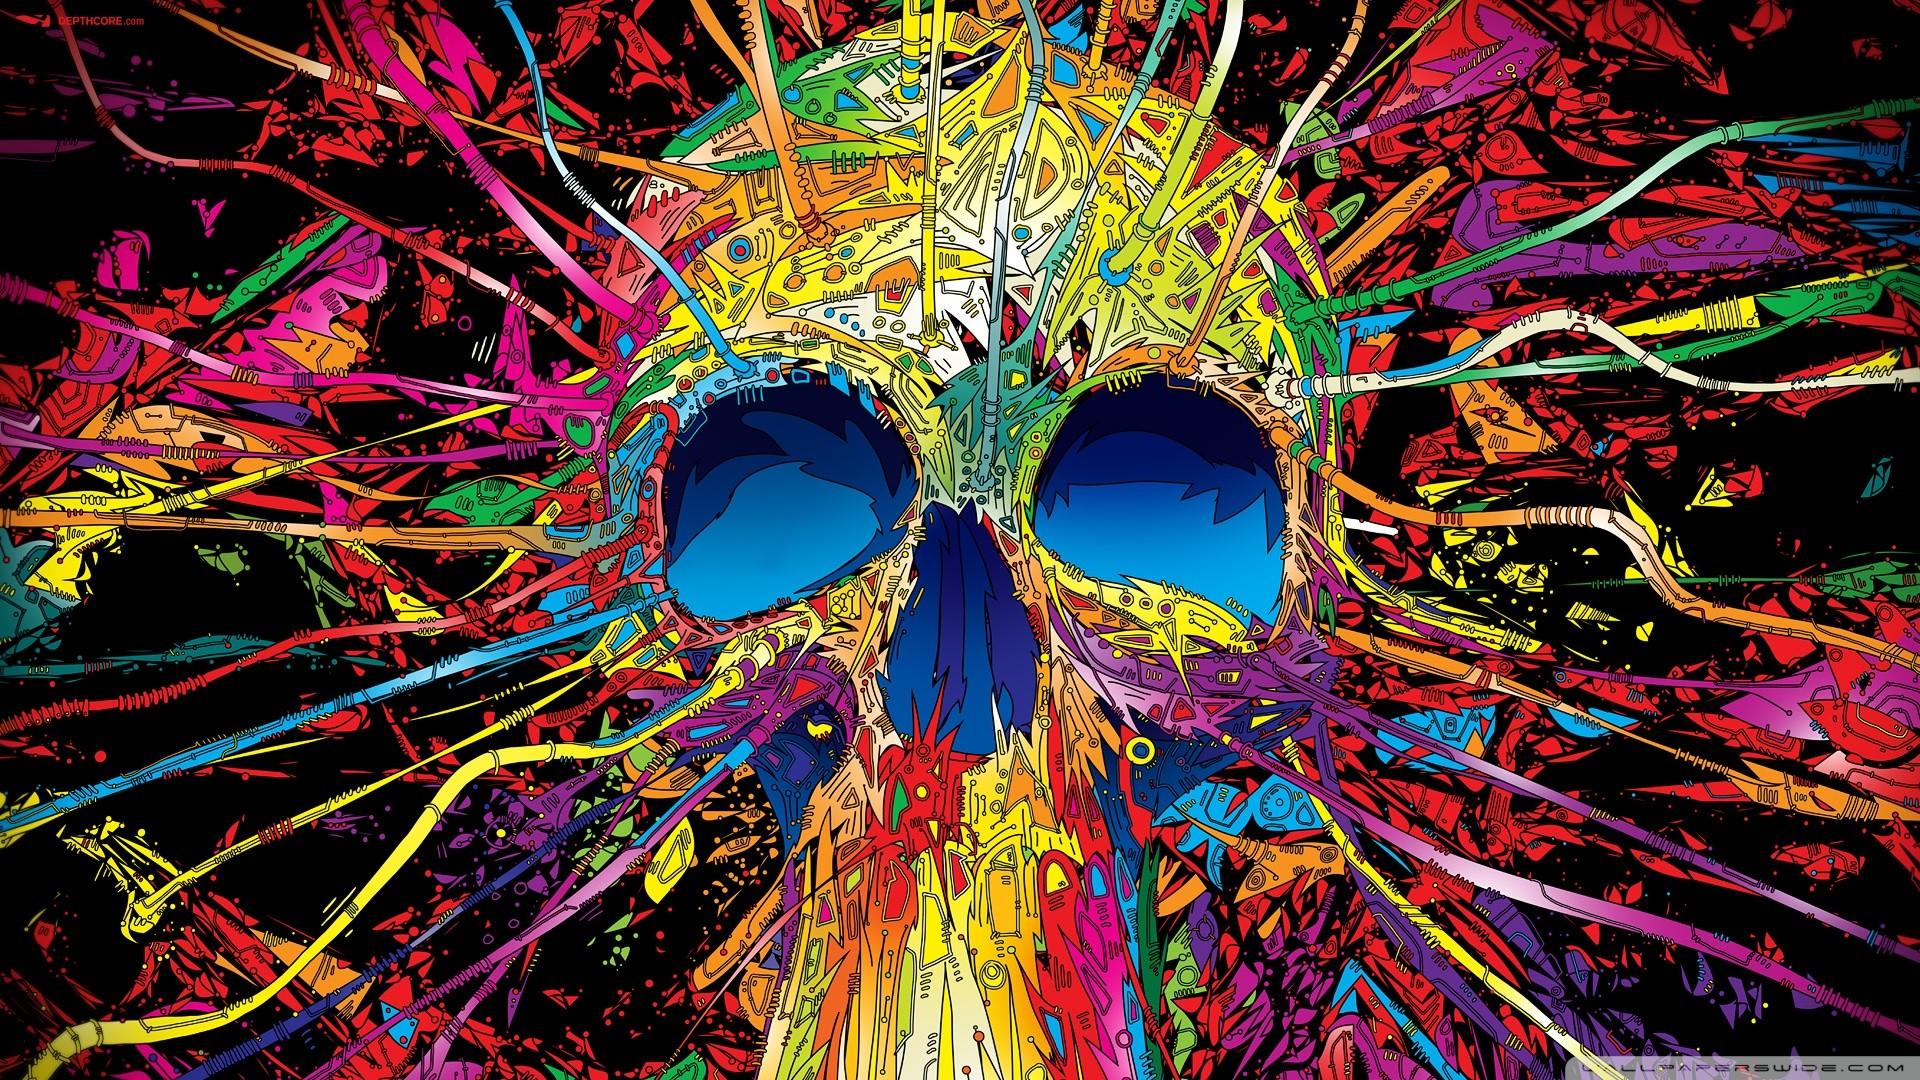 Skull Wallpaper Find best latest Skull Wallpaper in HD for your